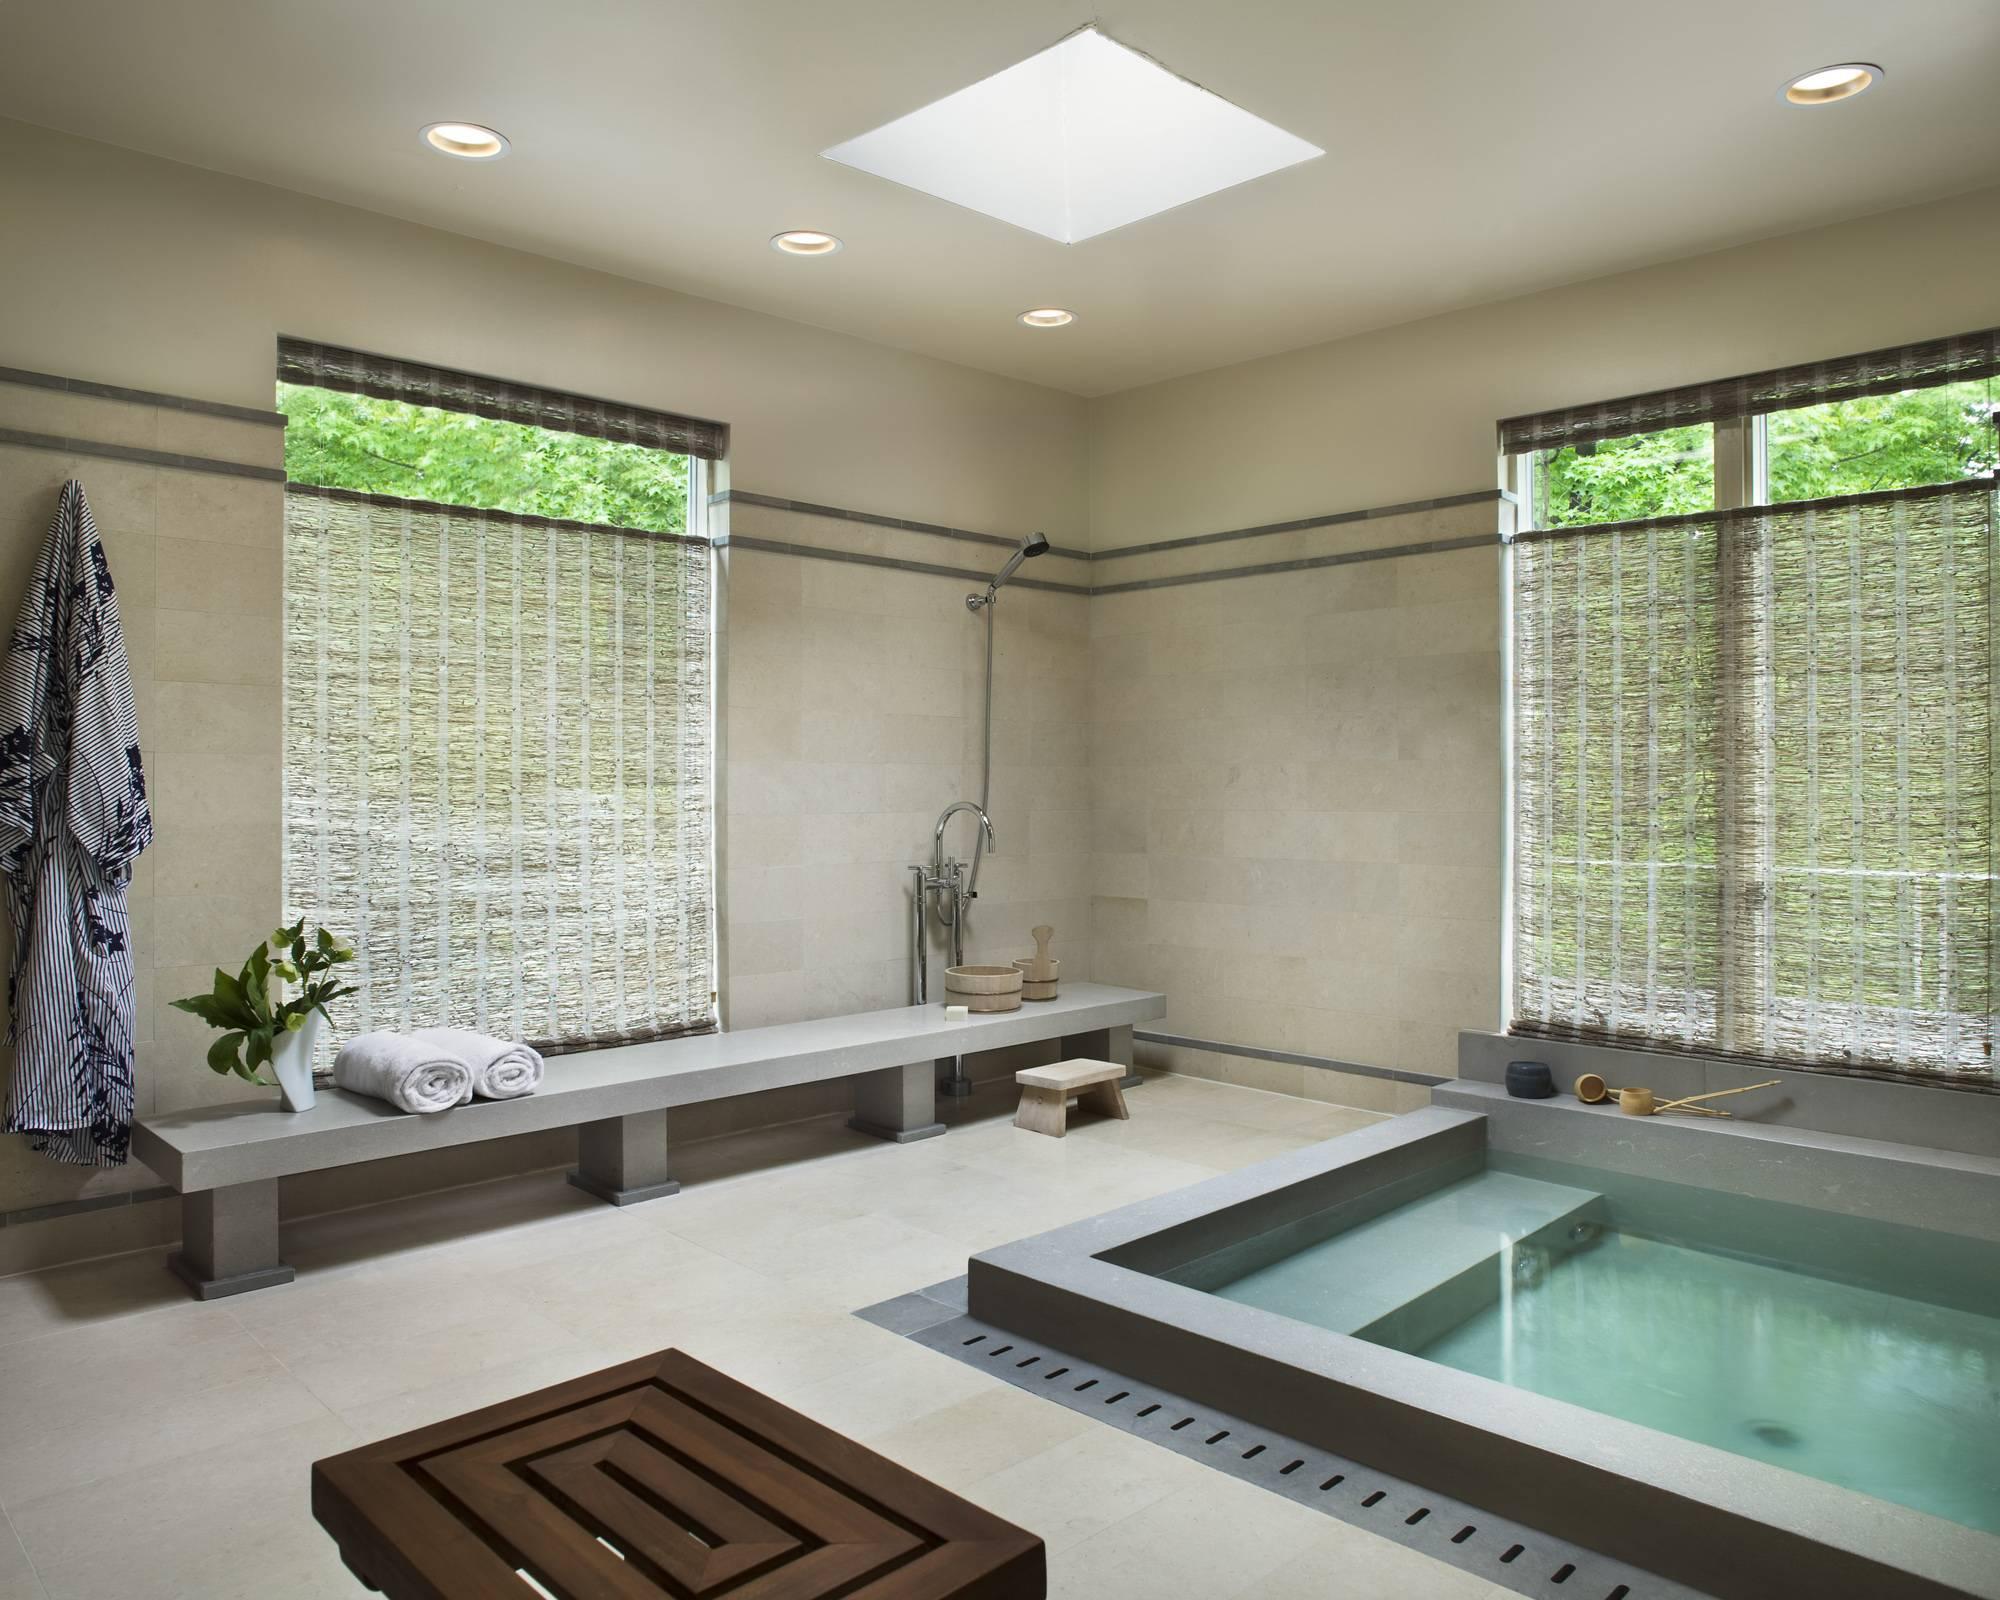 Concrete Sunken Bathtub with Pivot Window